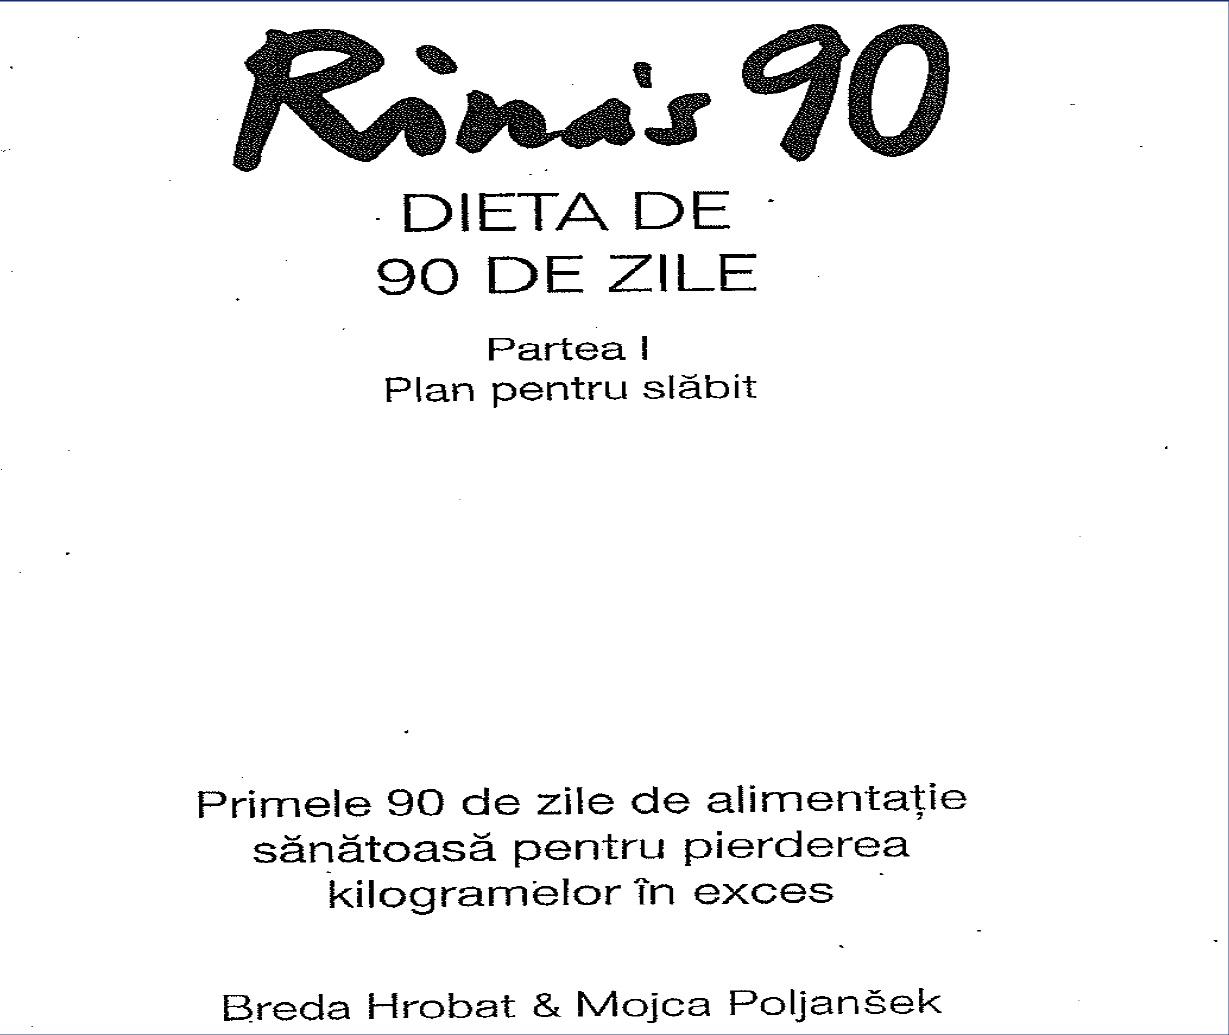 cartea dieta rina 90 de zile